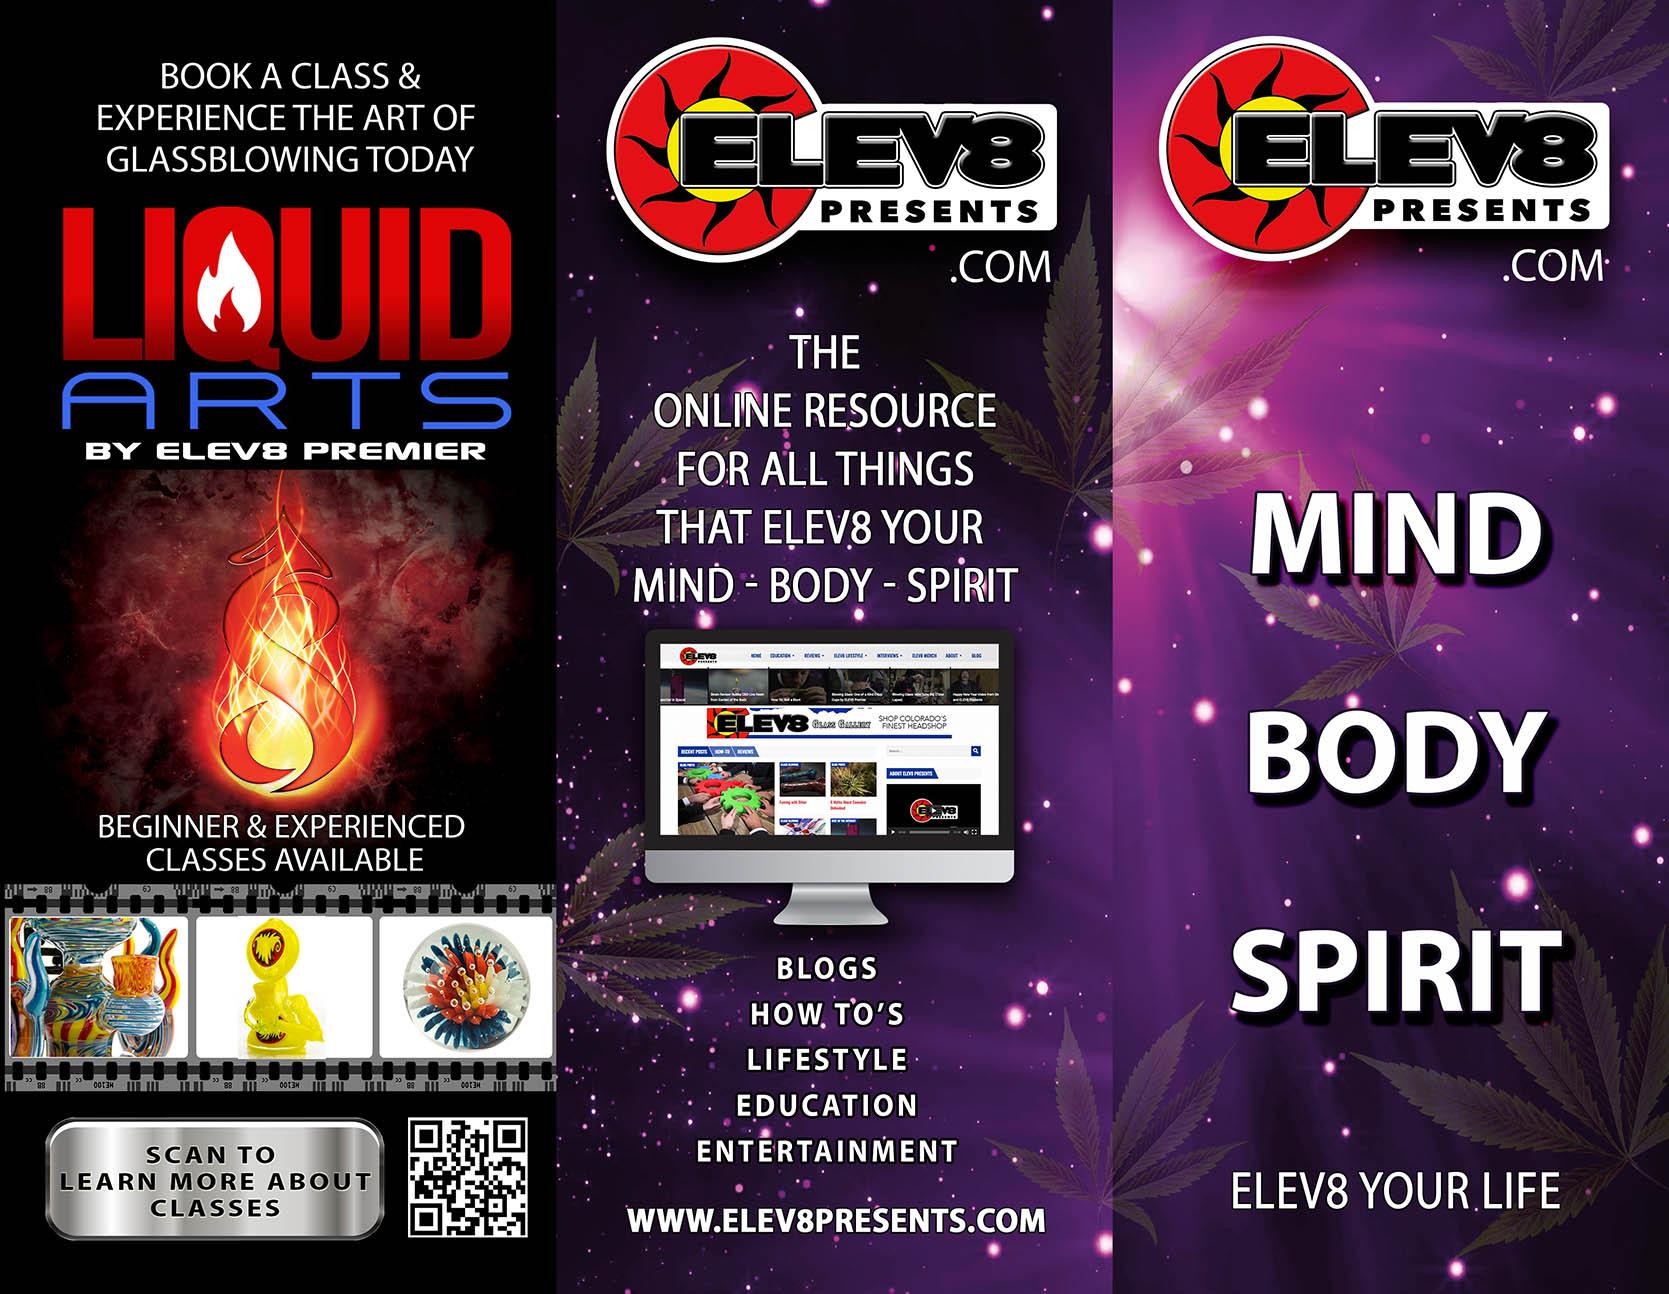 Elev8 Presents Tri-Fold Outside